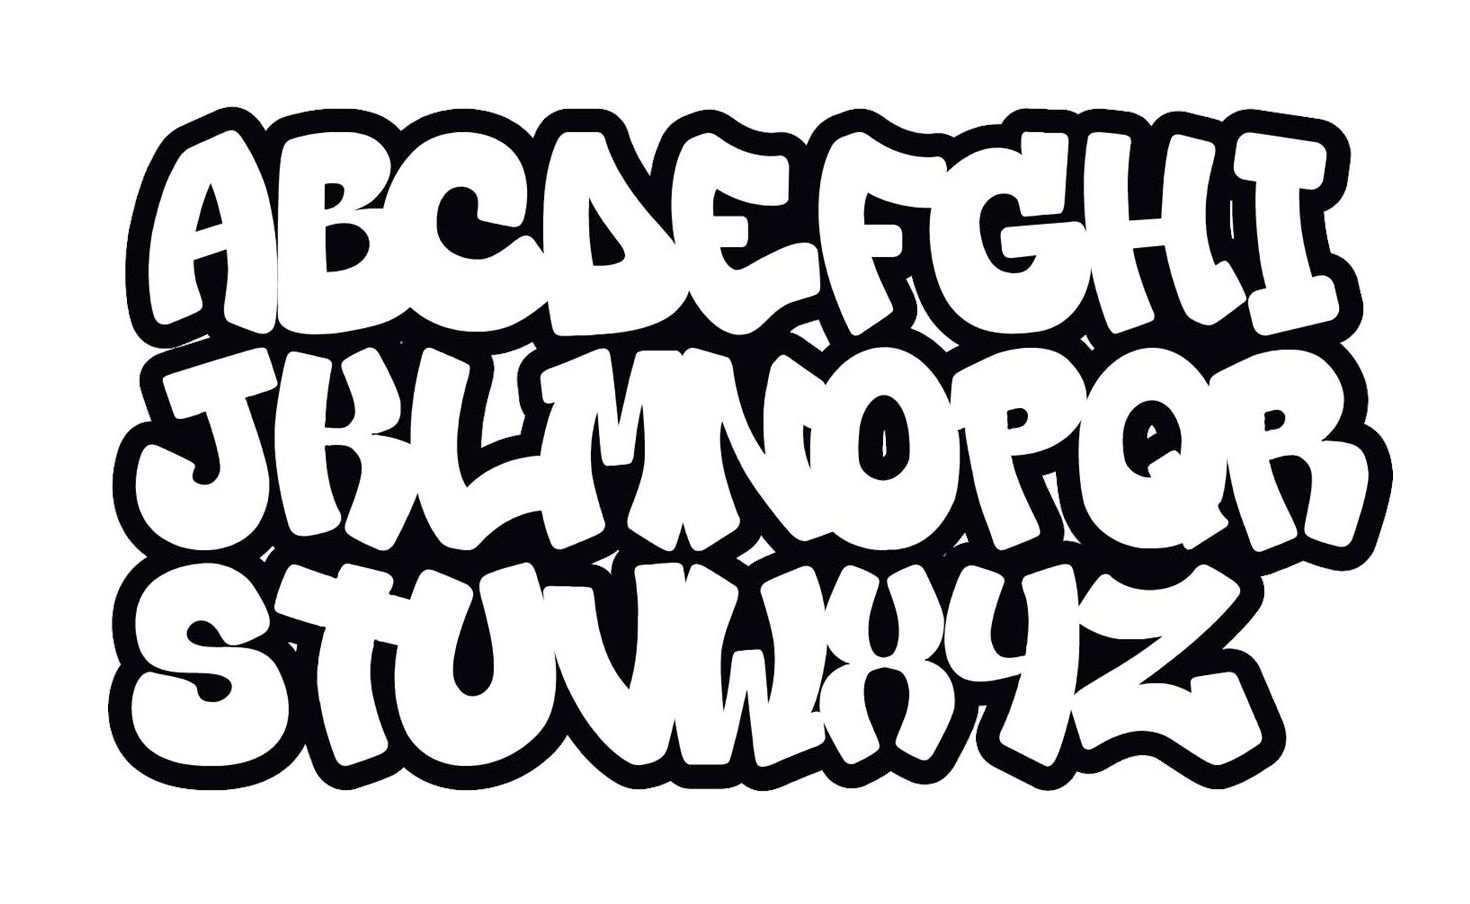 Das Beste Graffiti Buchstaben Abc Graffiti Schrift Alphabet Graffiti Schrift Und Bilder Graffiti Buchstaben Graffiti Schrift Schriften Alphabet